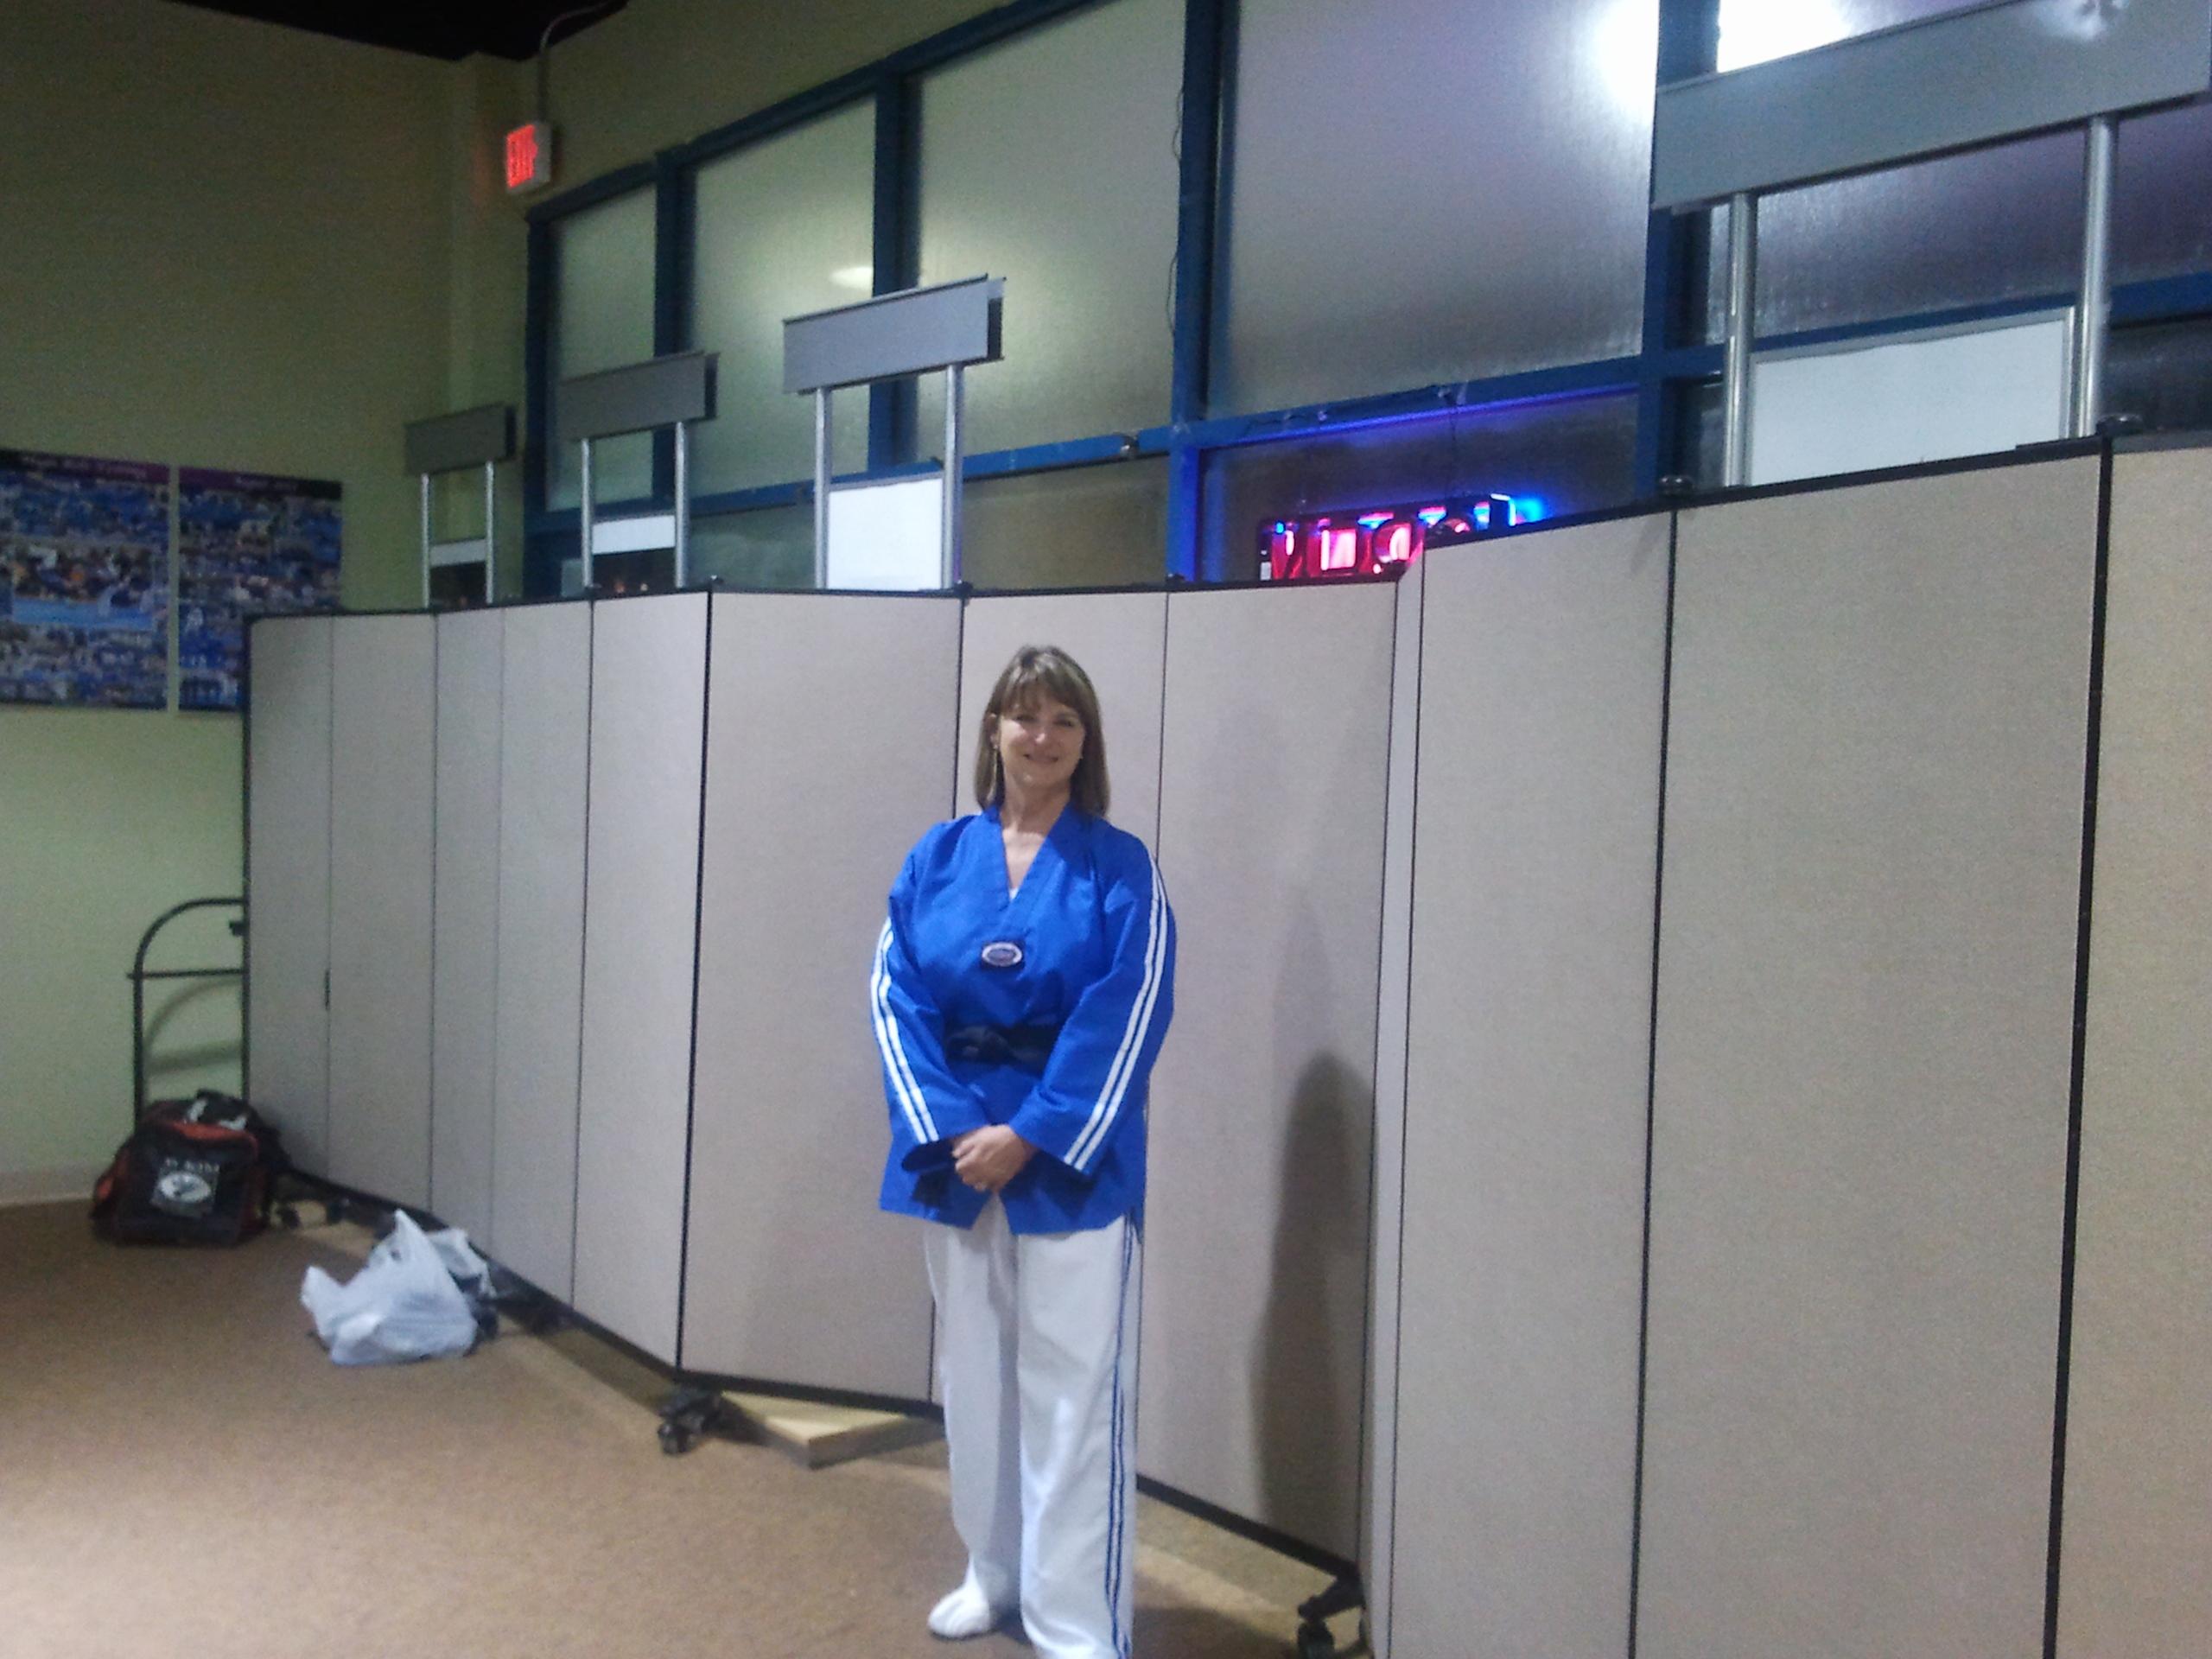 Divdiers in a taekwondo class